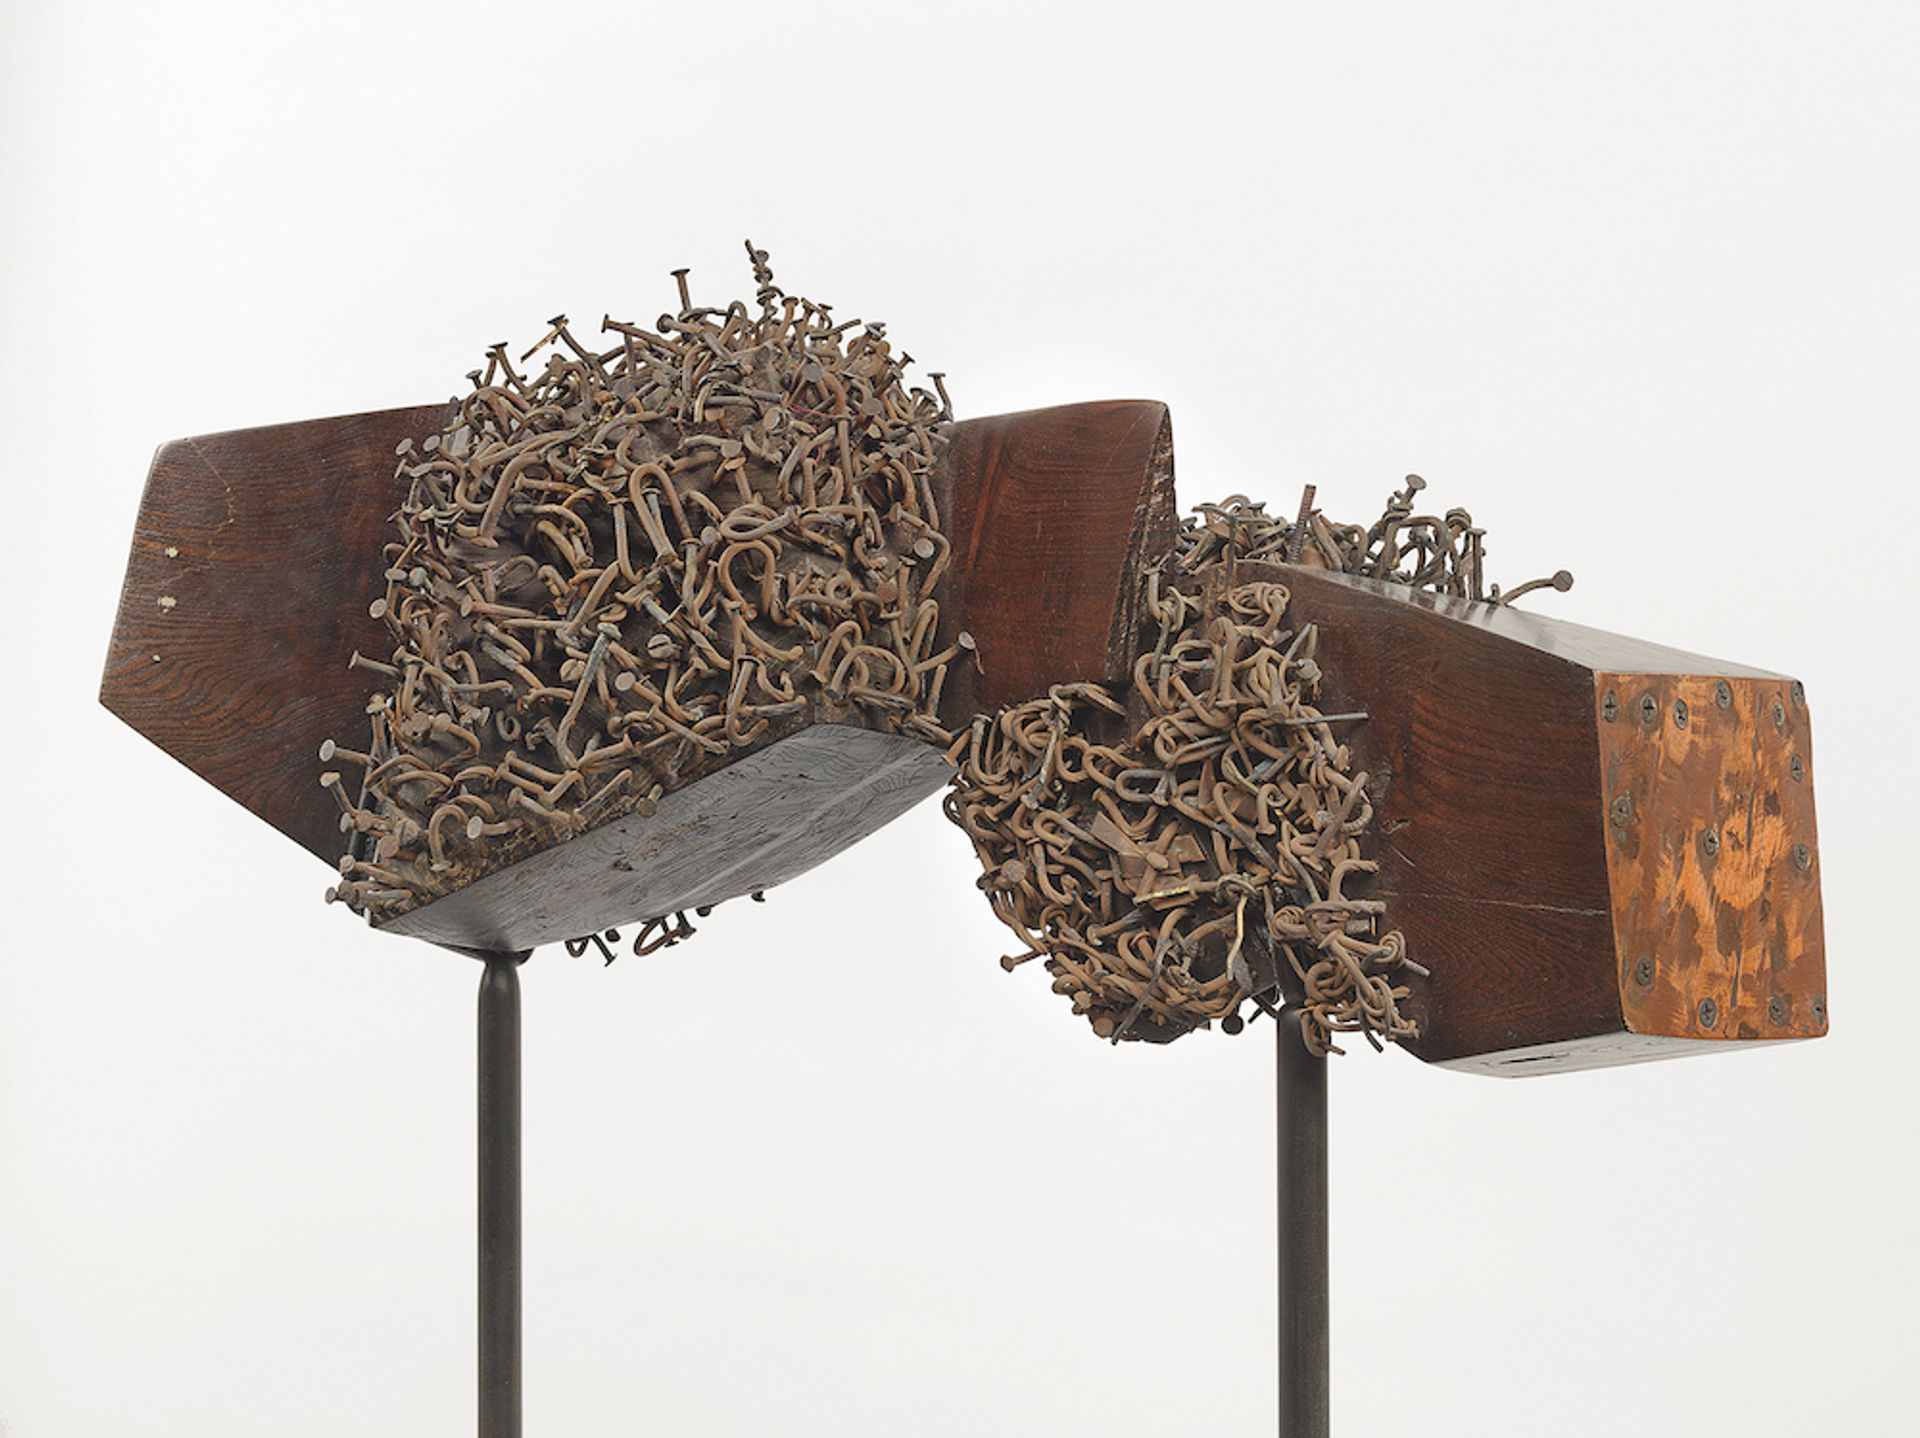 Jack Whitten, The Afro American Thunderbolt, 1983-84 Metropolitan Museum of Art/Met Breuer